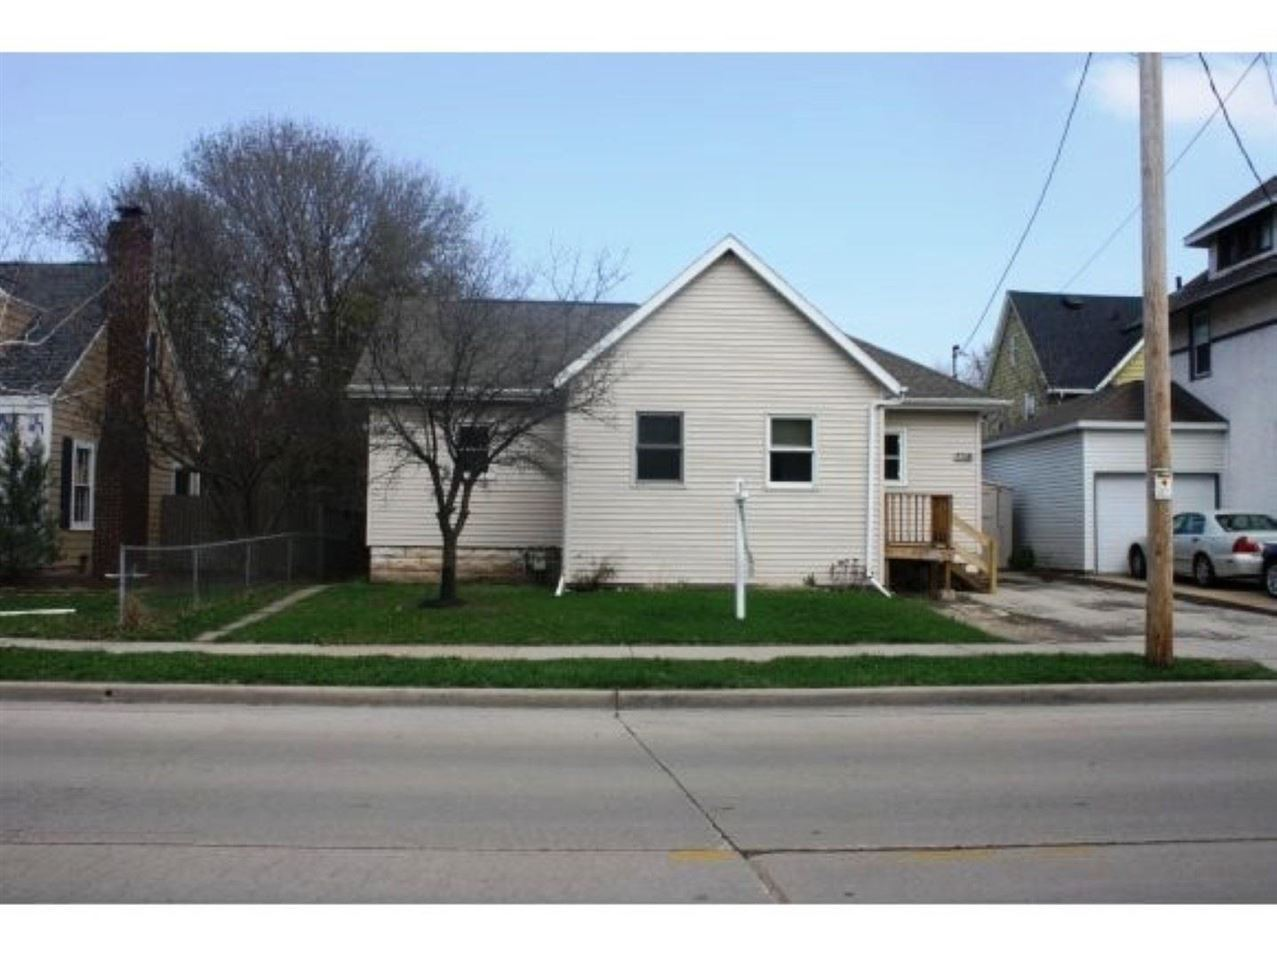 508 N RANKIN Street, Appleton, WI 54911 - MLS#: 50243198